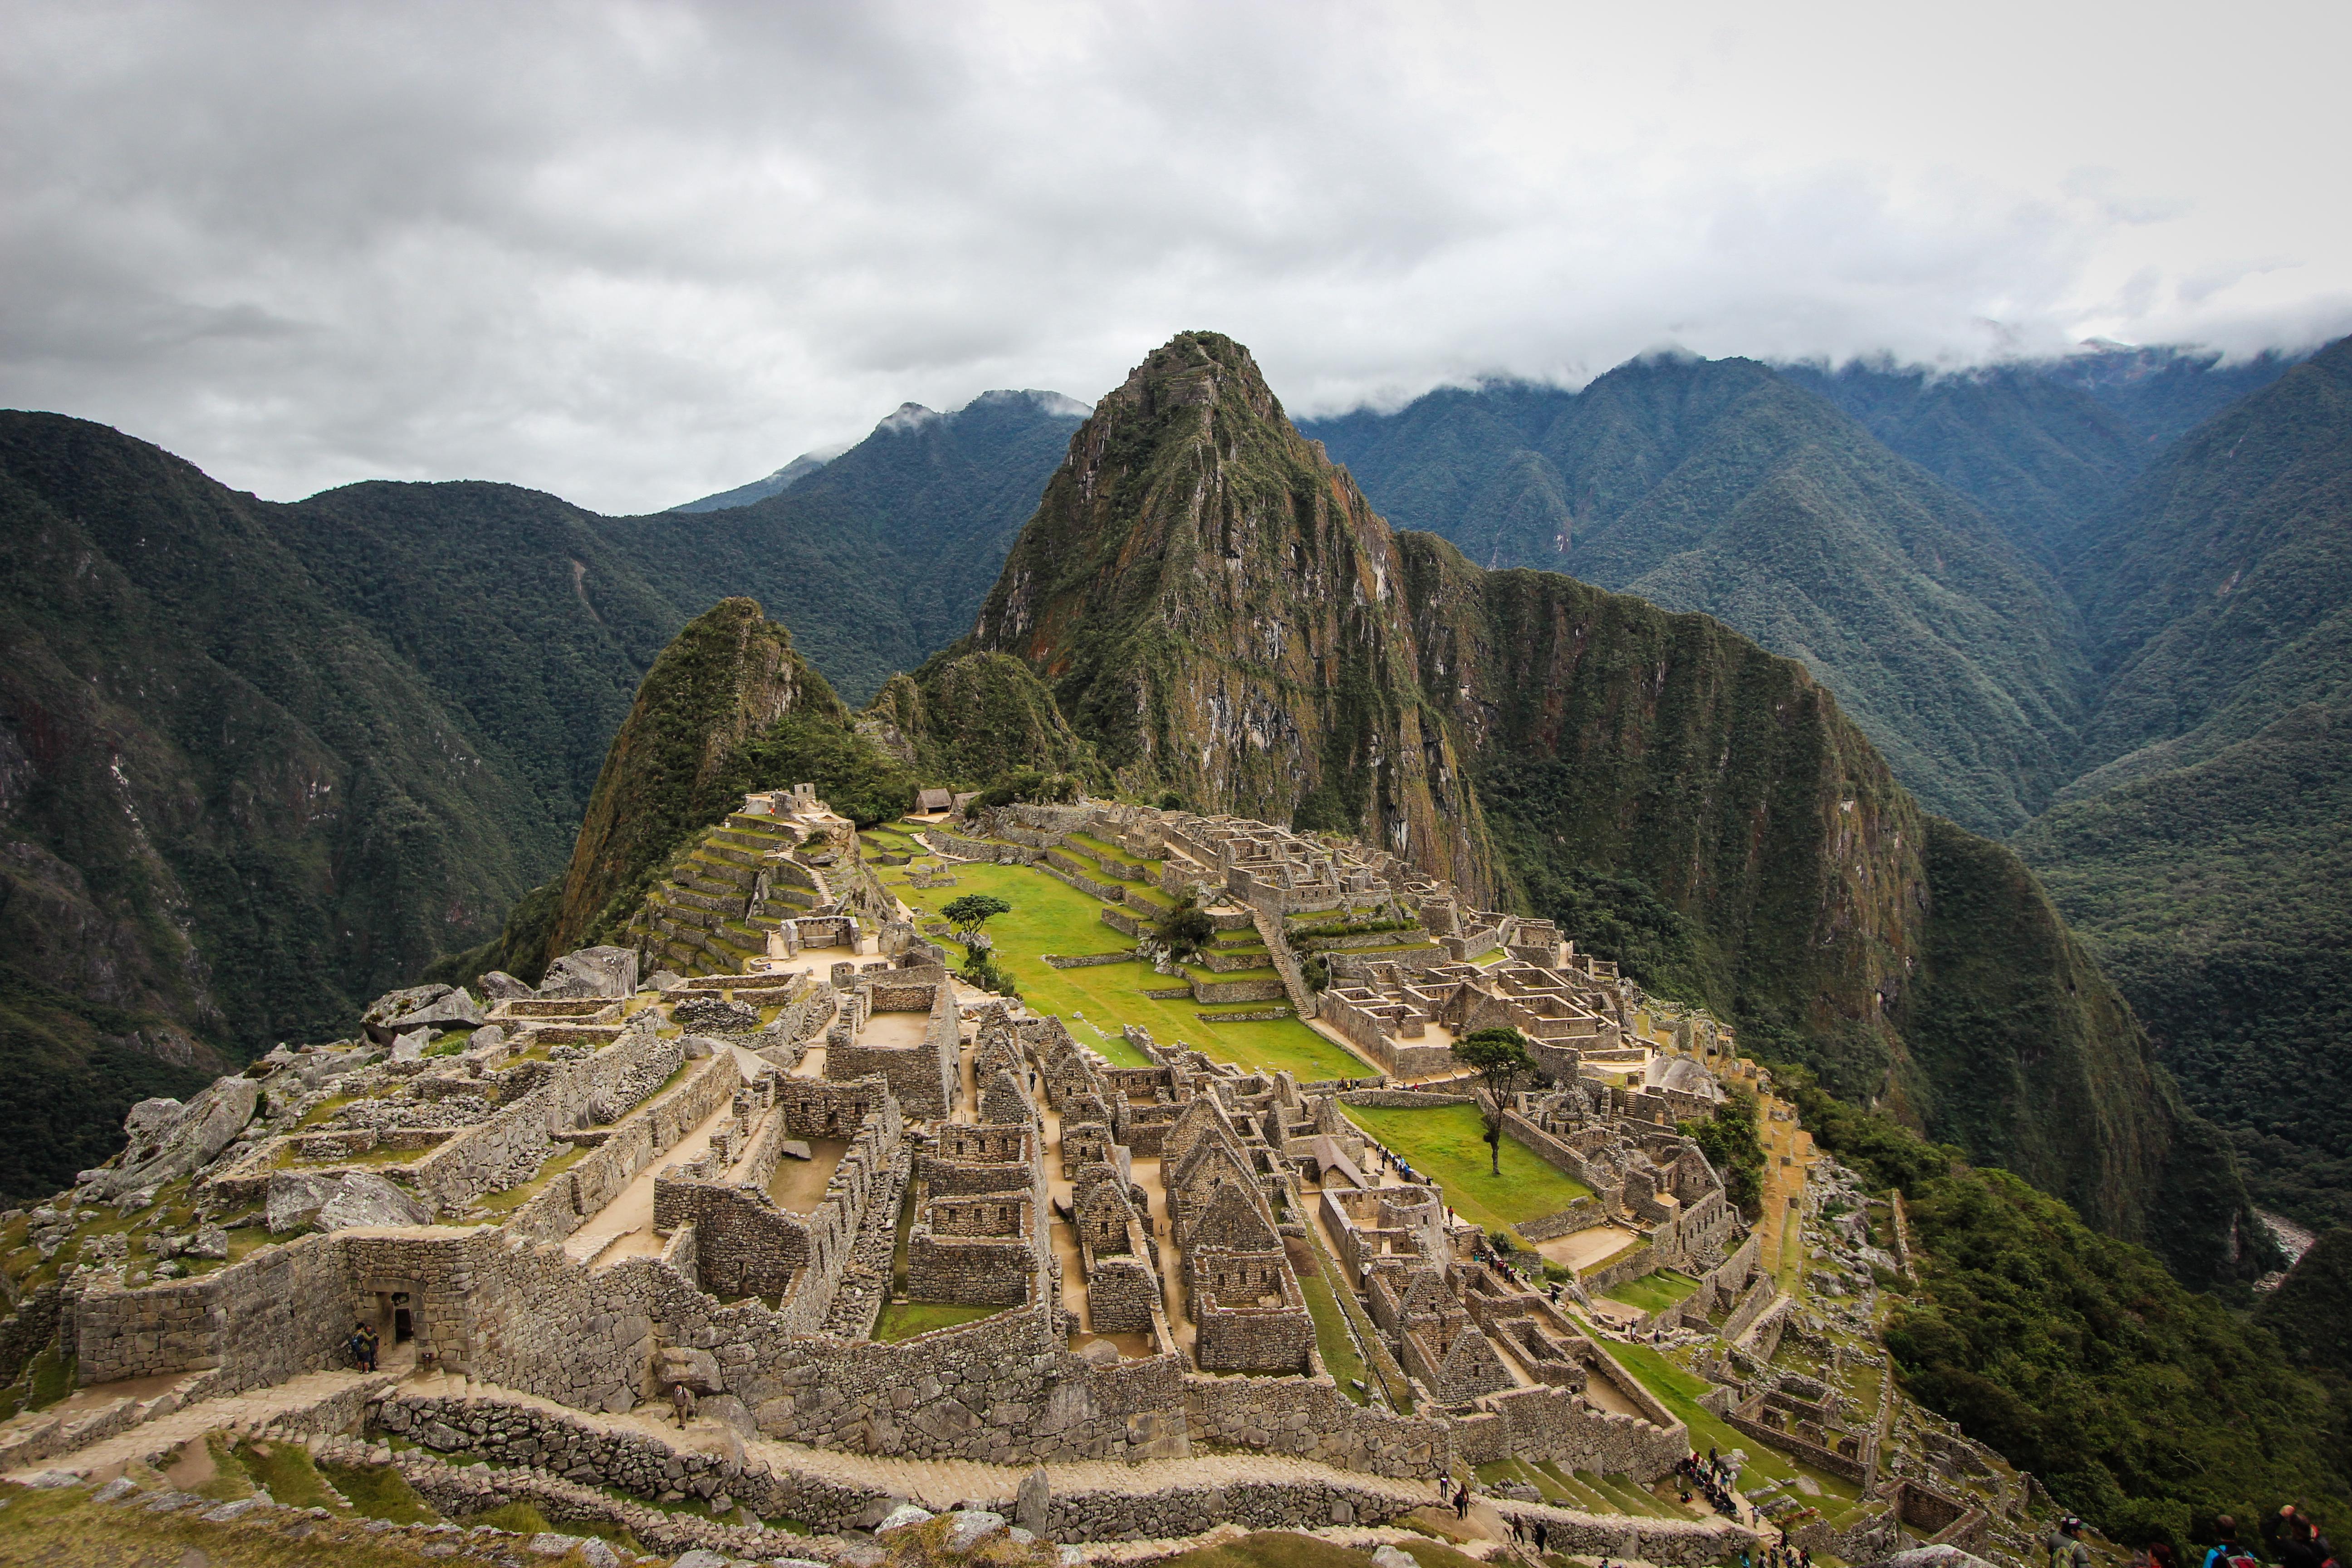 Salkantay Trek Machu Picchu